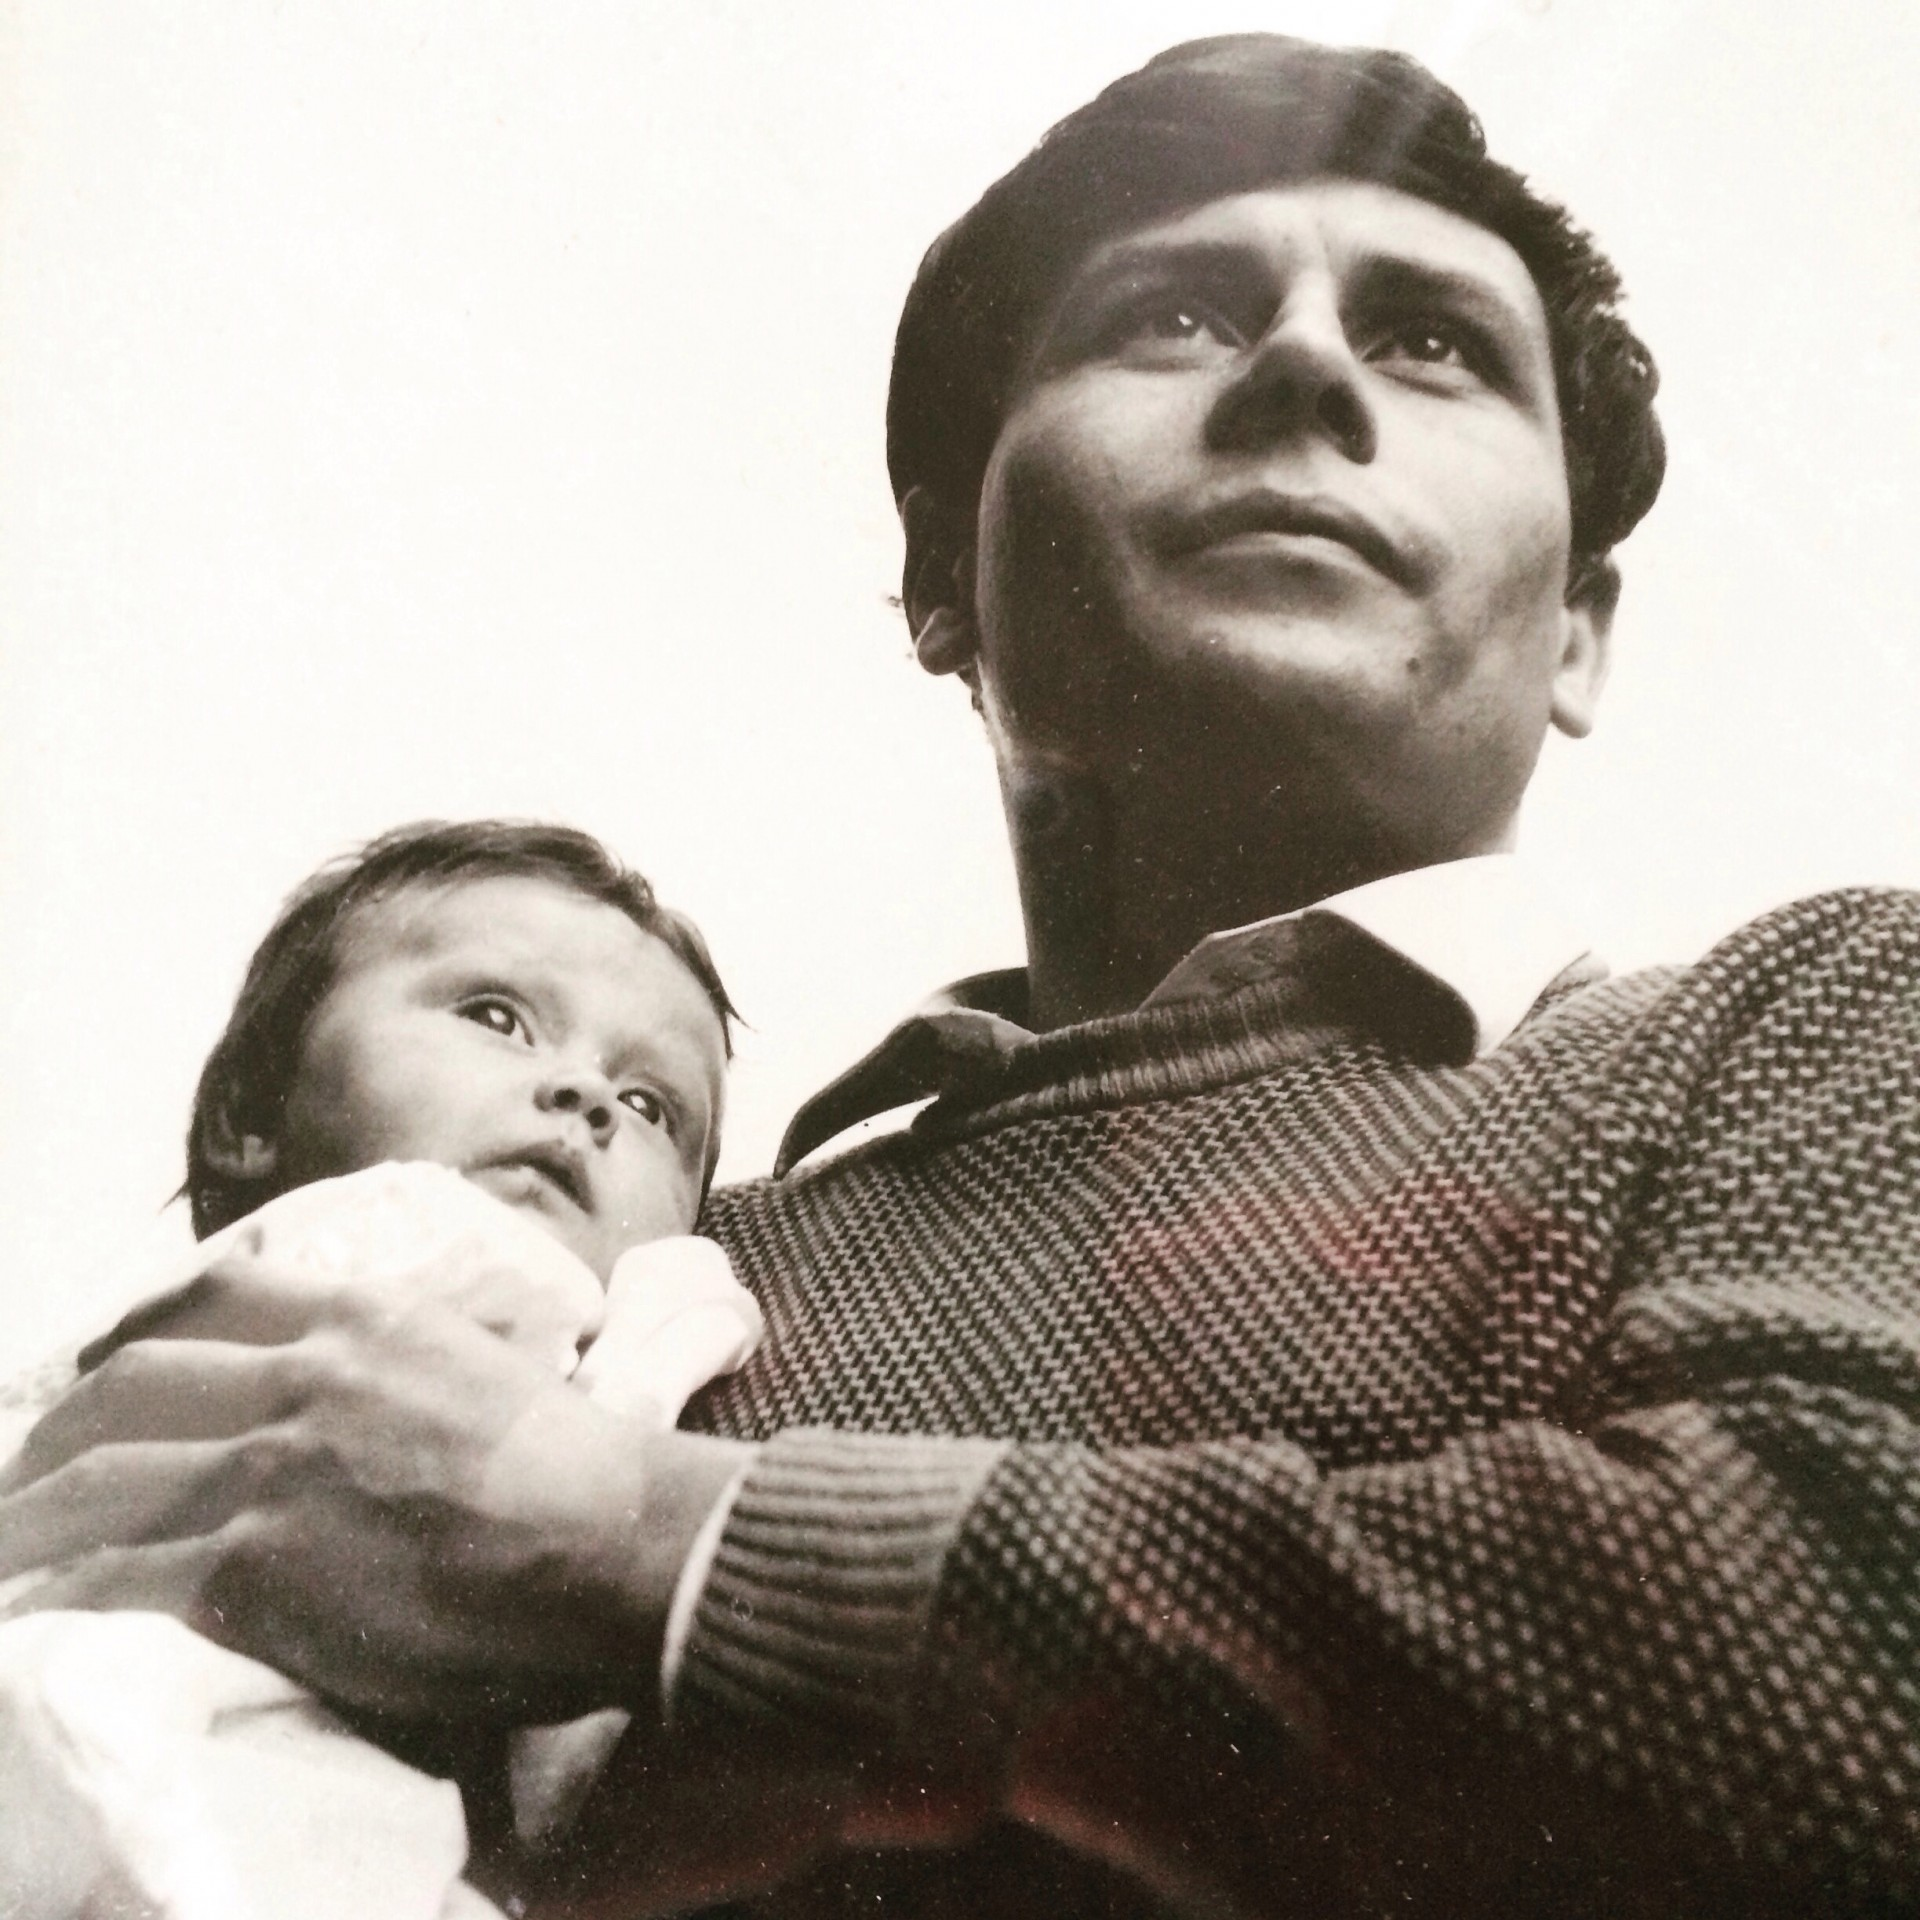 Helen Storey with her father. Photographer John Haynes.